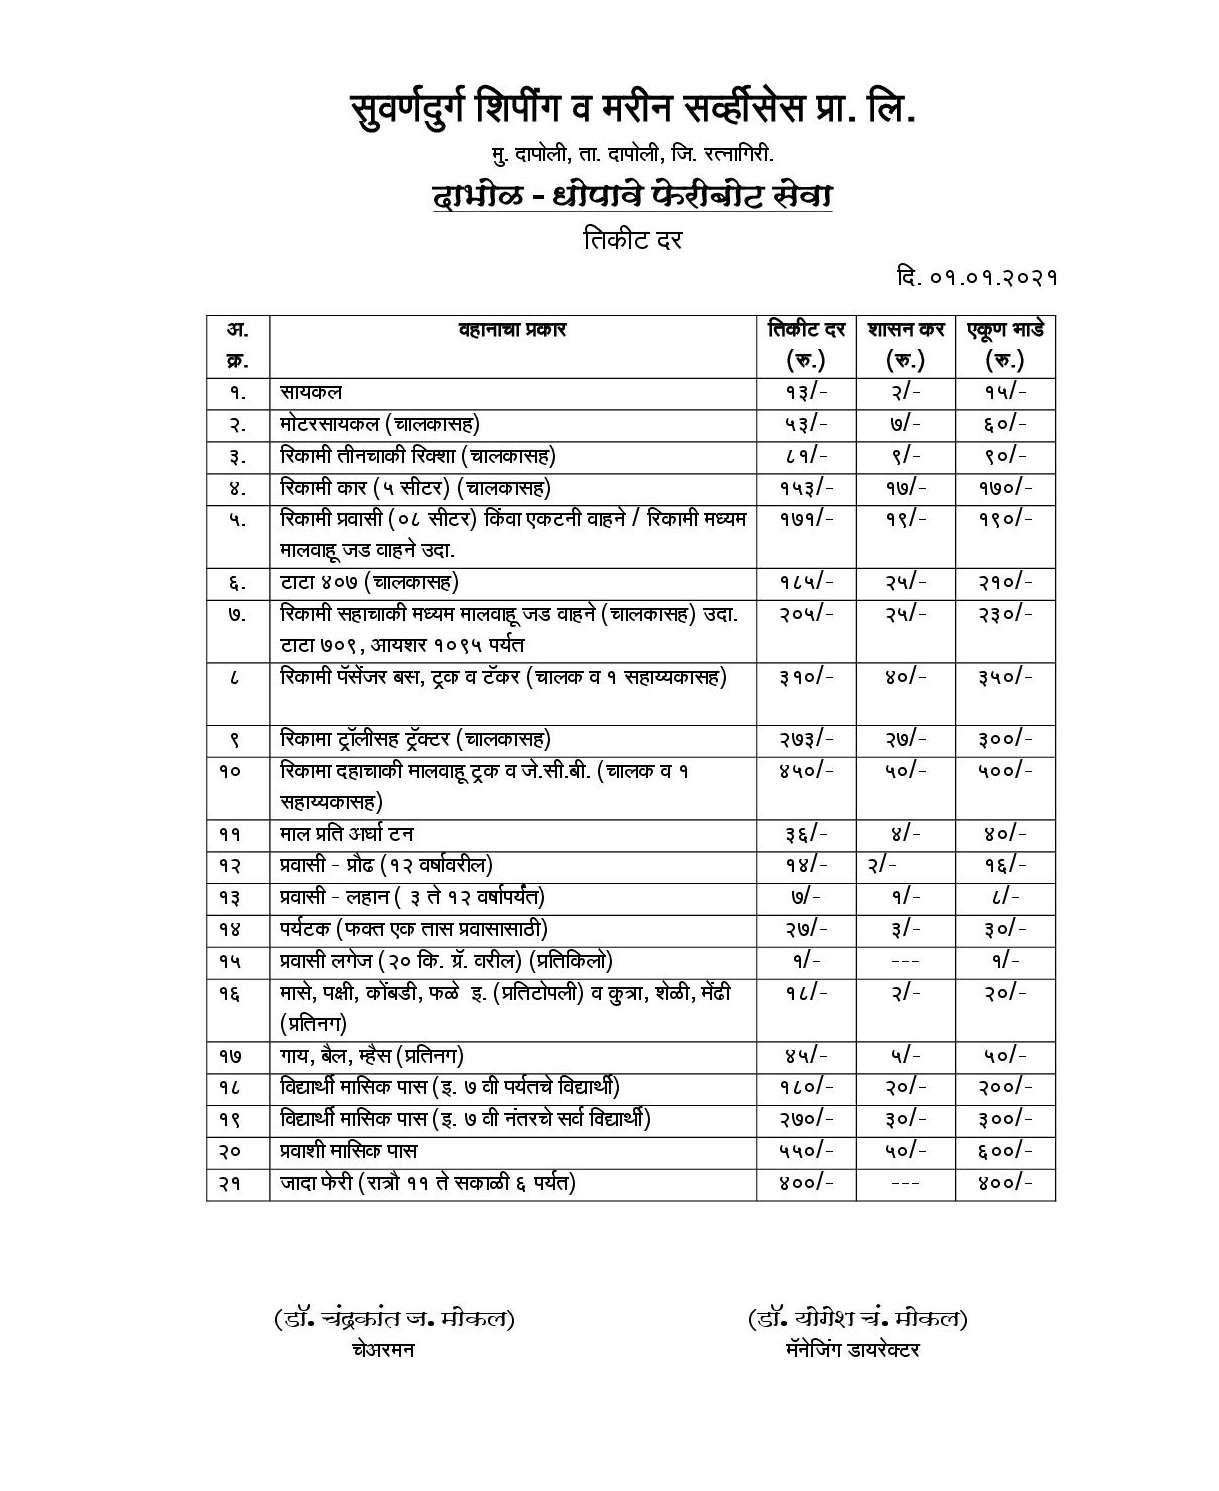 Dabhol Ferry Rates